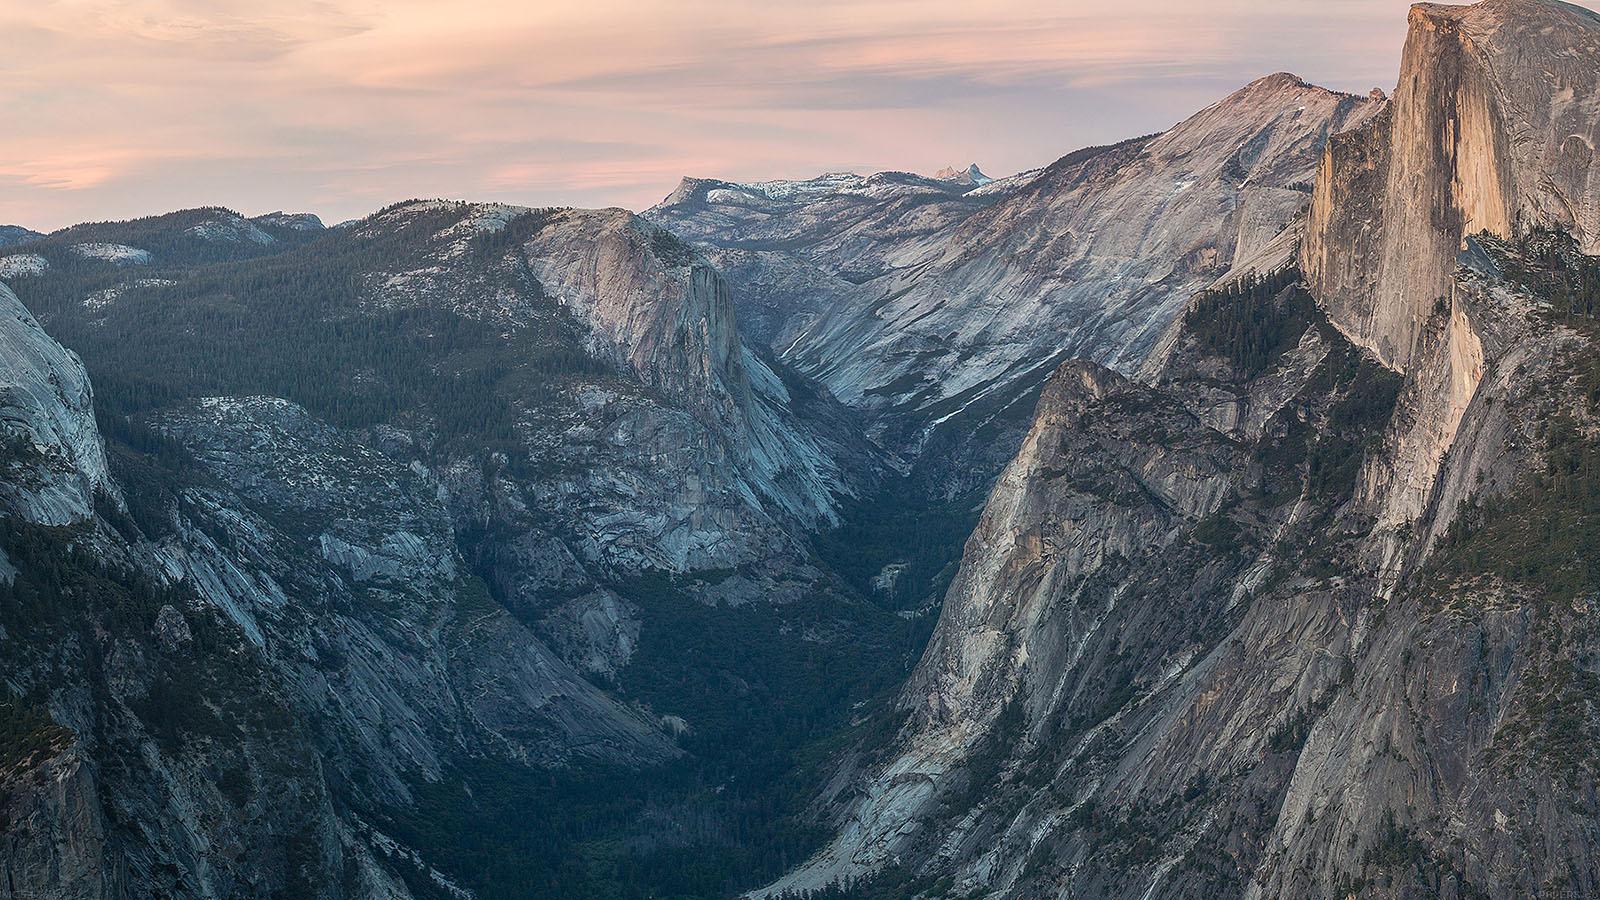 mc54-wallpaper-glacier-point-at-sunset-yosemite-mountain ...